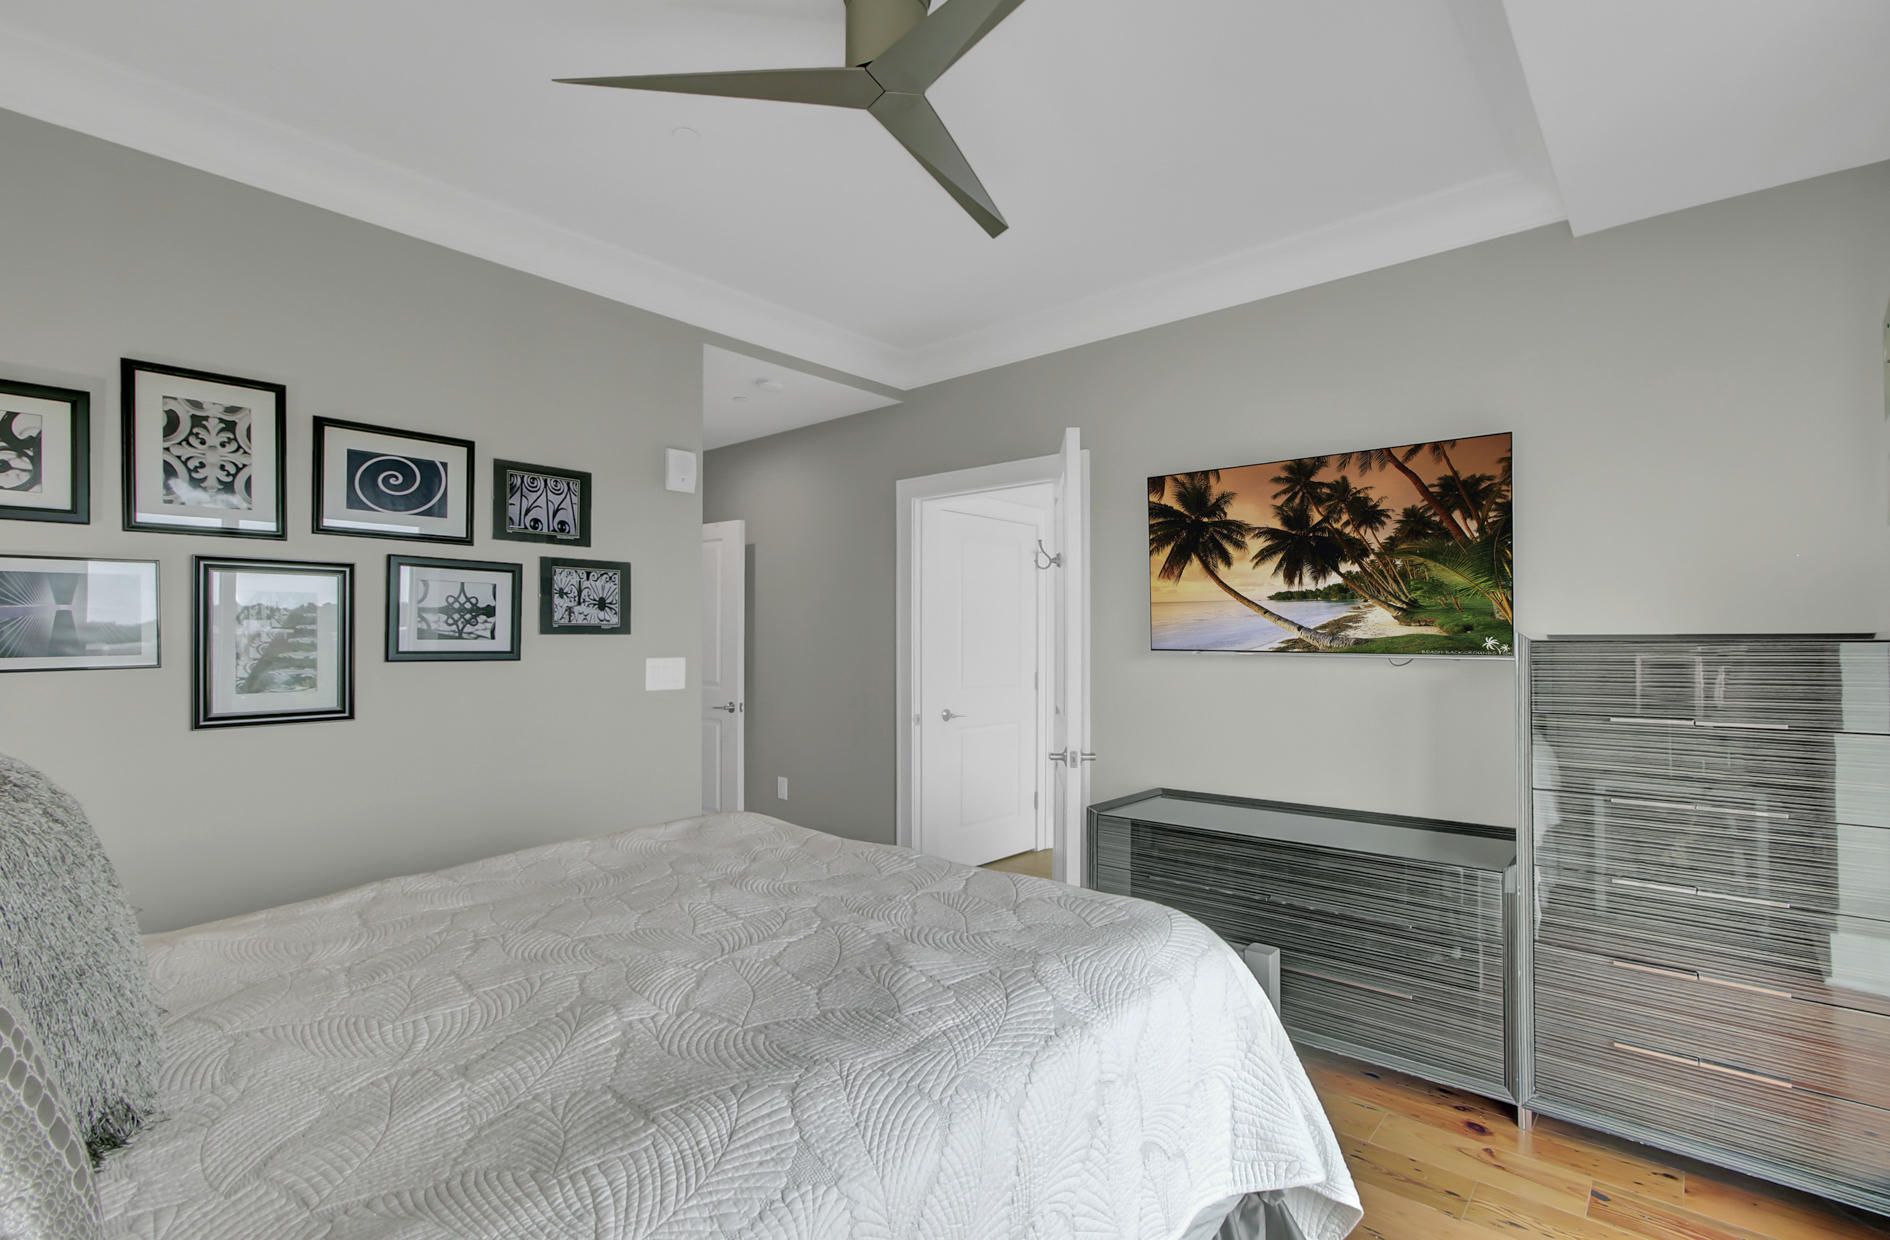 Tides IV Condominiums Homes For Sale - 155 Wingo Way, Mount Pleasant, SC - 33